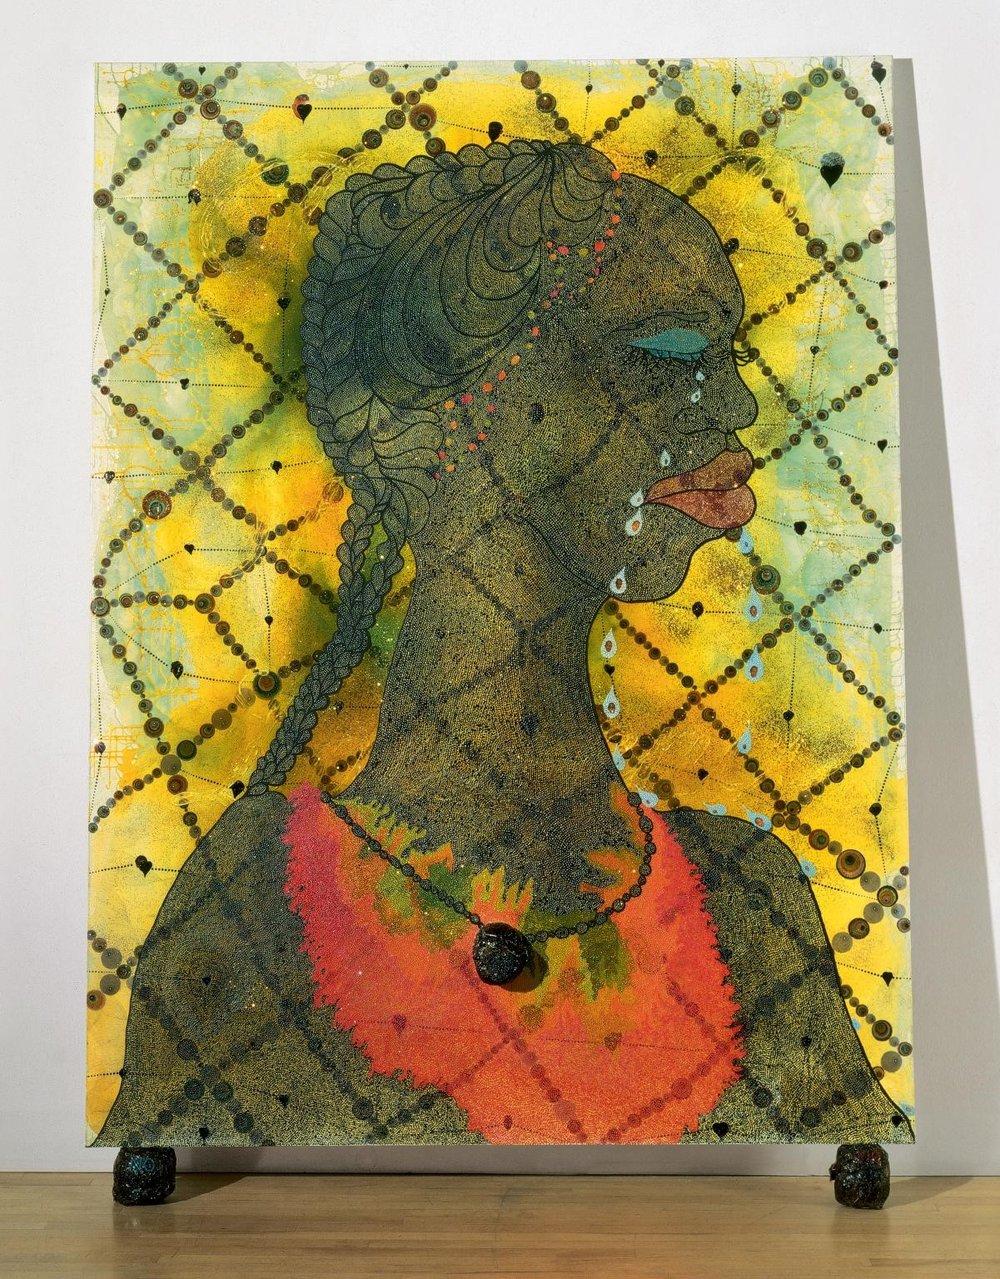 Chris Ofili,  No Woman No Cry , 1998, mixed media, 2438 x 1828 mm, Tate Britain, London.   http://www.tate.org.uk/art/artworks/ofili-no-woman-no-cry-t07502